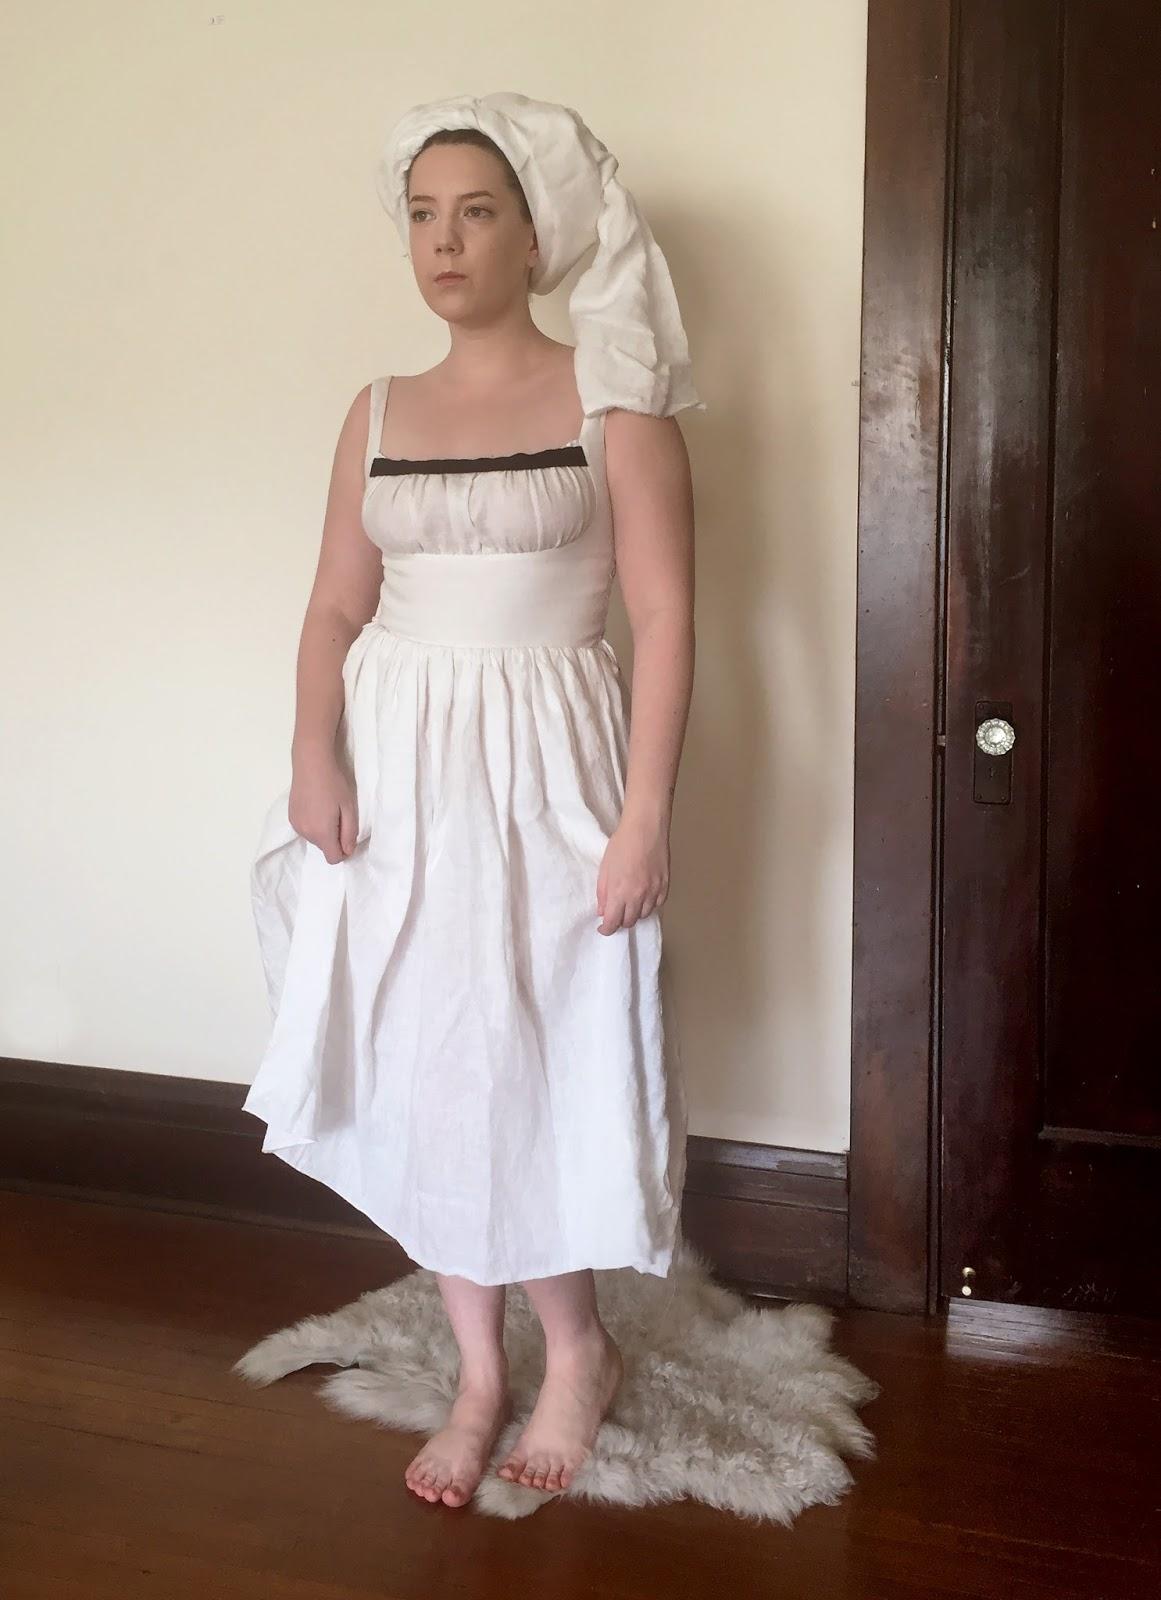 Gwendolyn Grey: 15th / 16th cen. German sleeveless chemise- Finished!